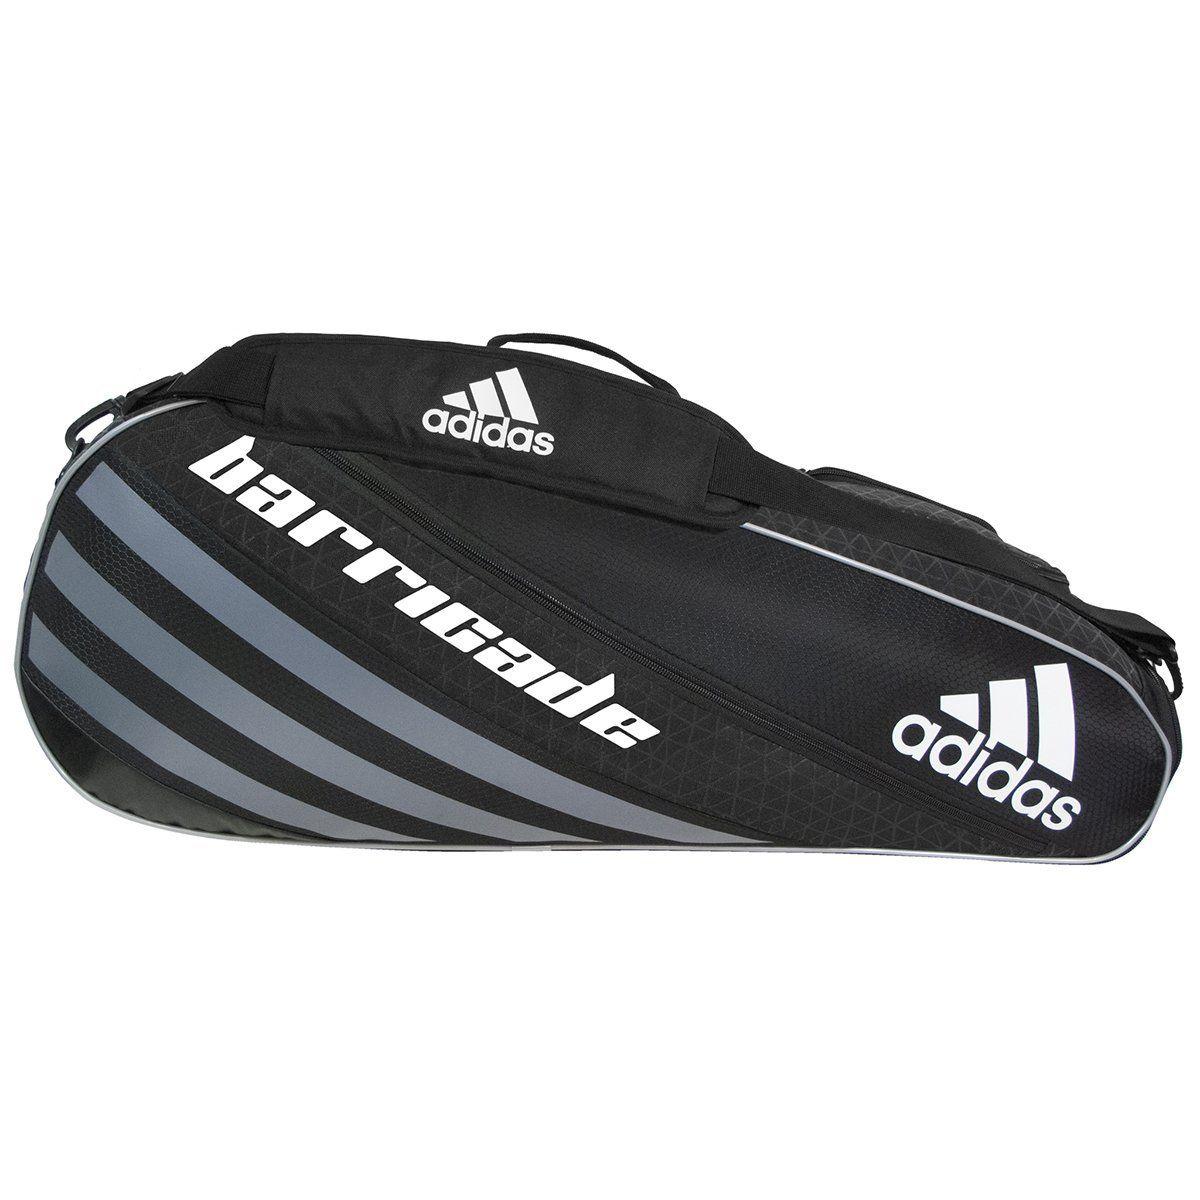 Amazon Com Adidas Barricade Iv Tour 3 Racquet Bag Black Dark Silver One Size Clothing Racquet Bag Adidas Barricade Tennis Backpack